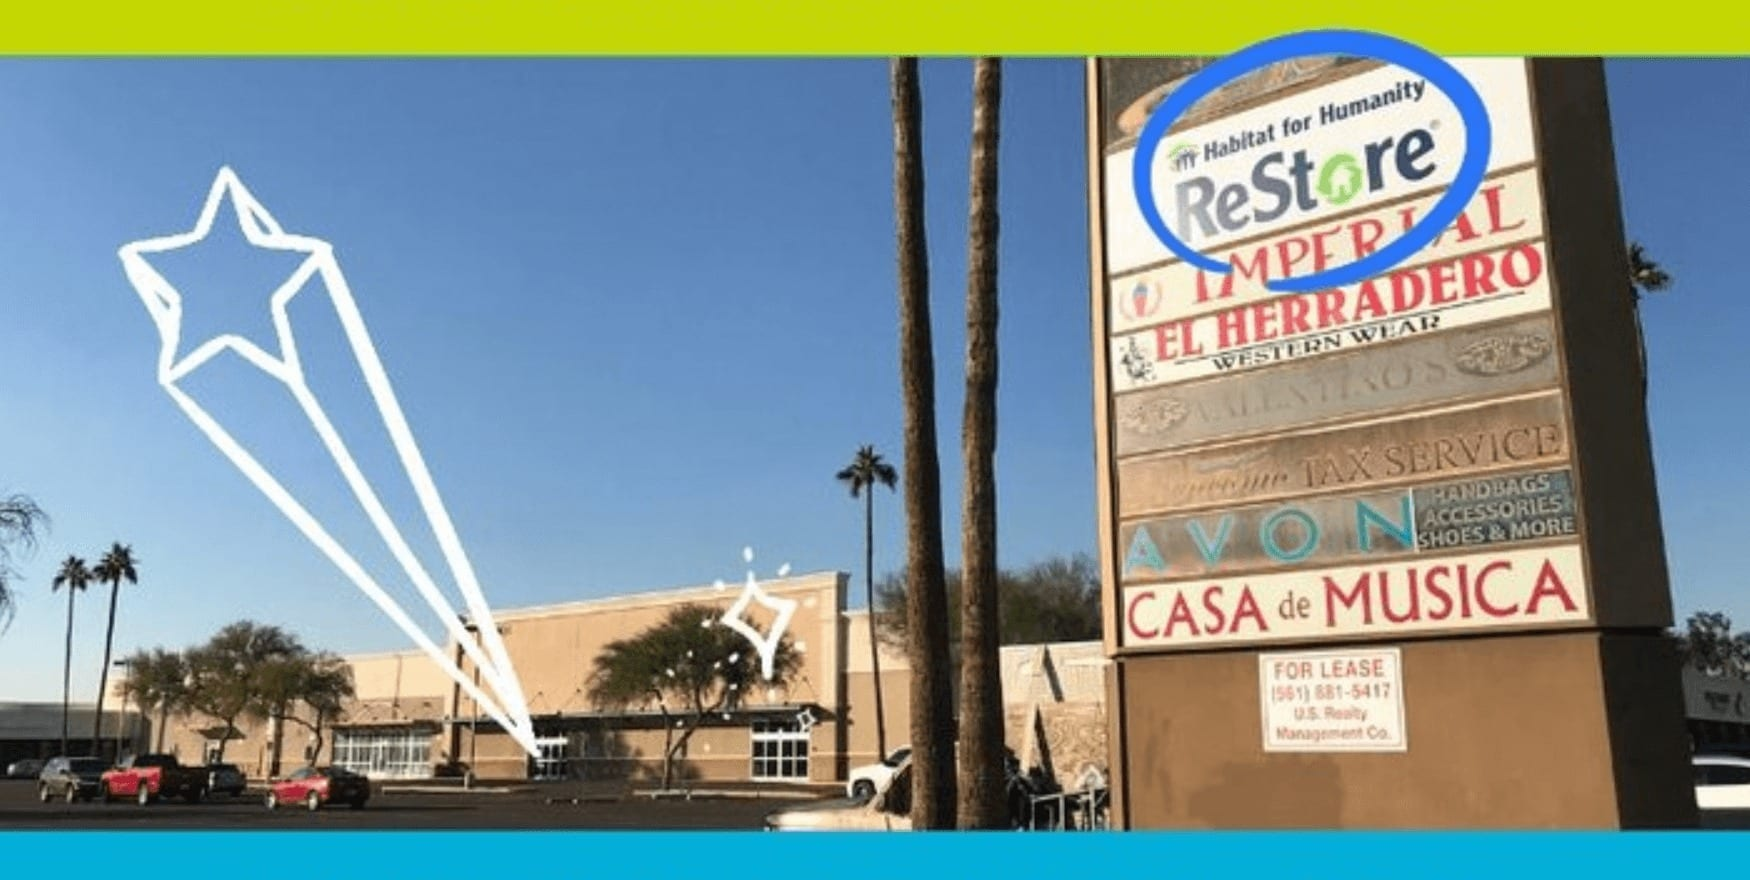 ReStore storefront - Tempe, Arizona